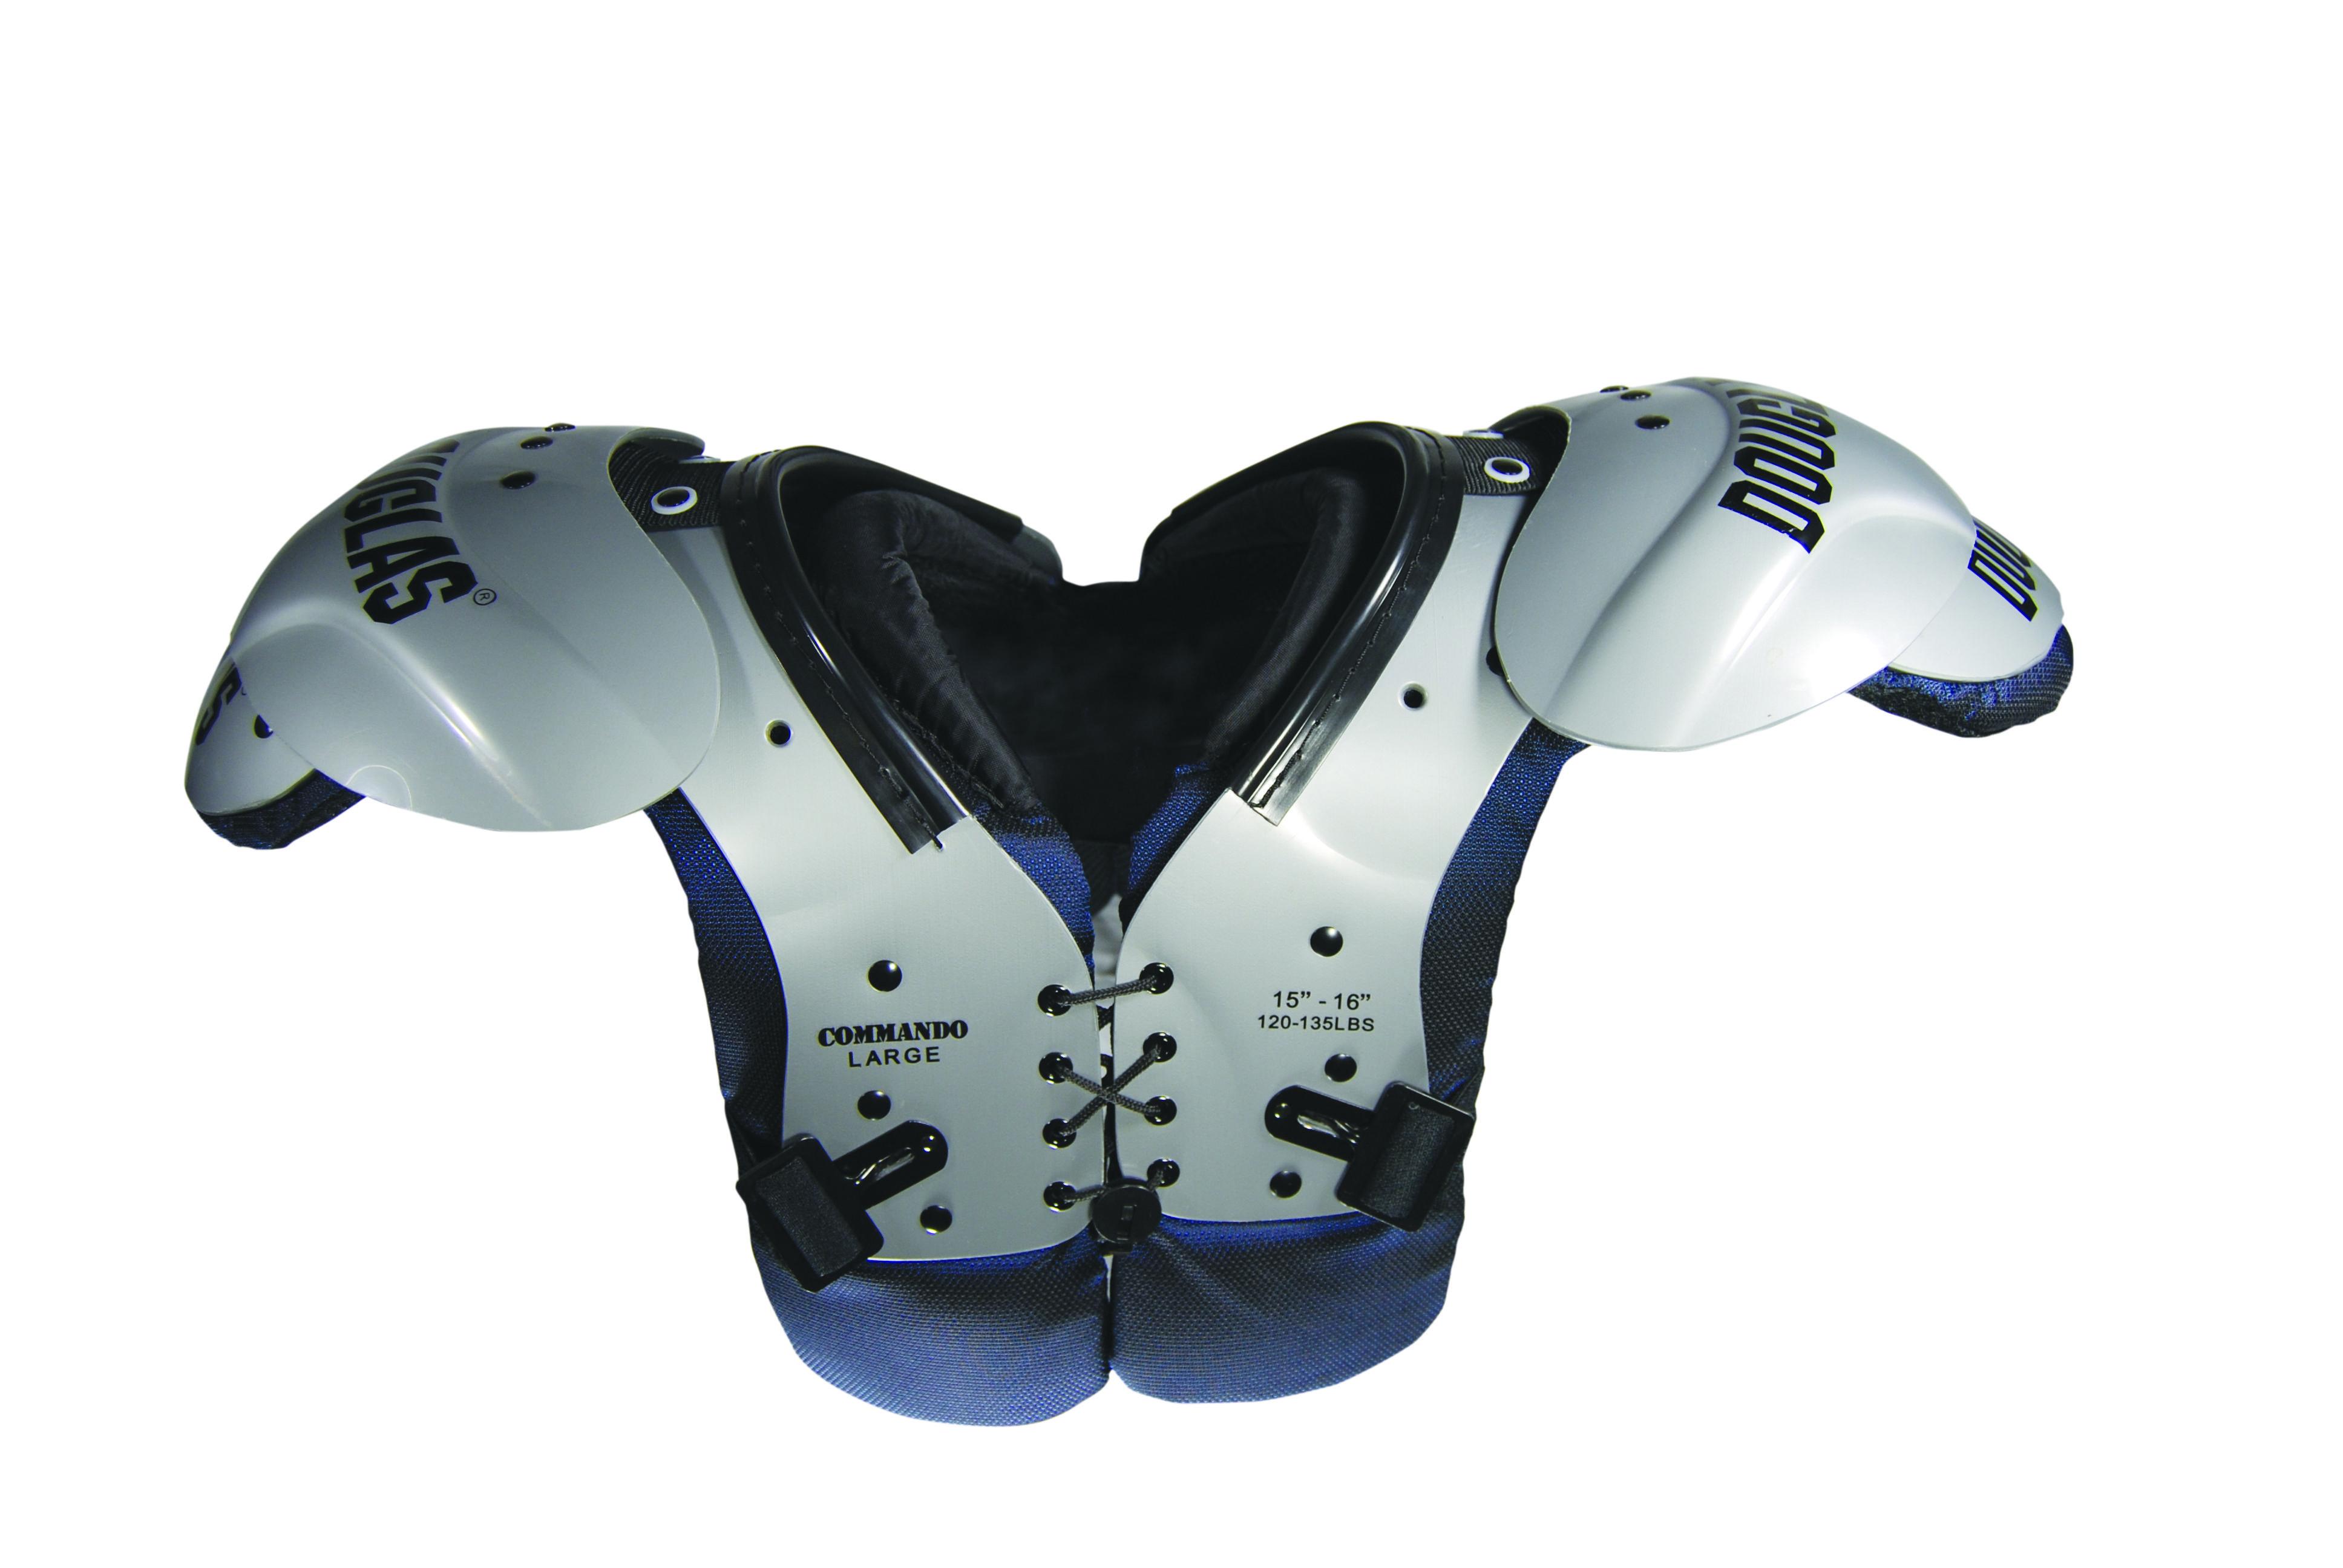 Douglas commando series youth shoulder pad football